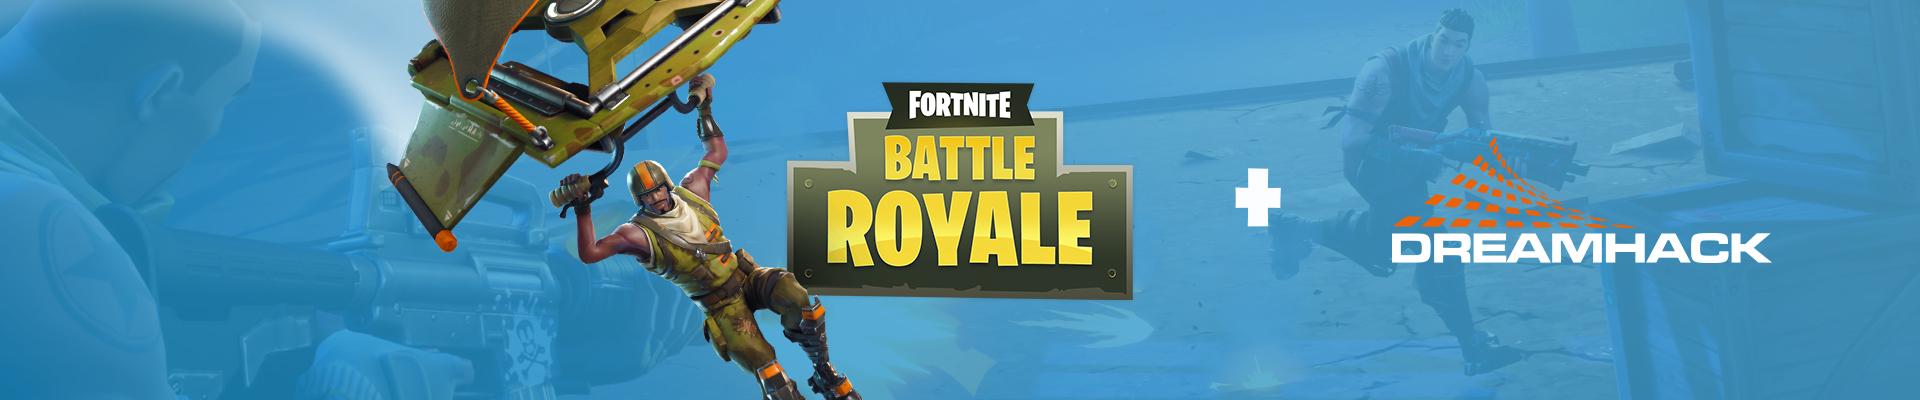 Fortnite Da Epic Games